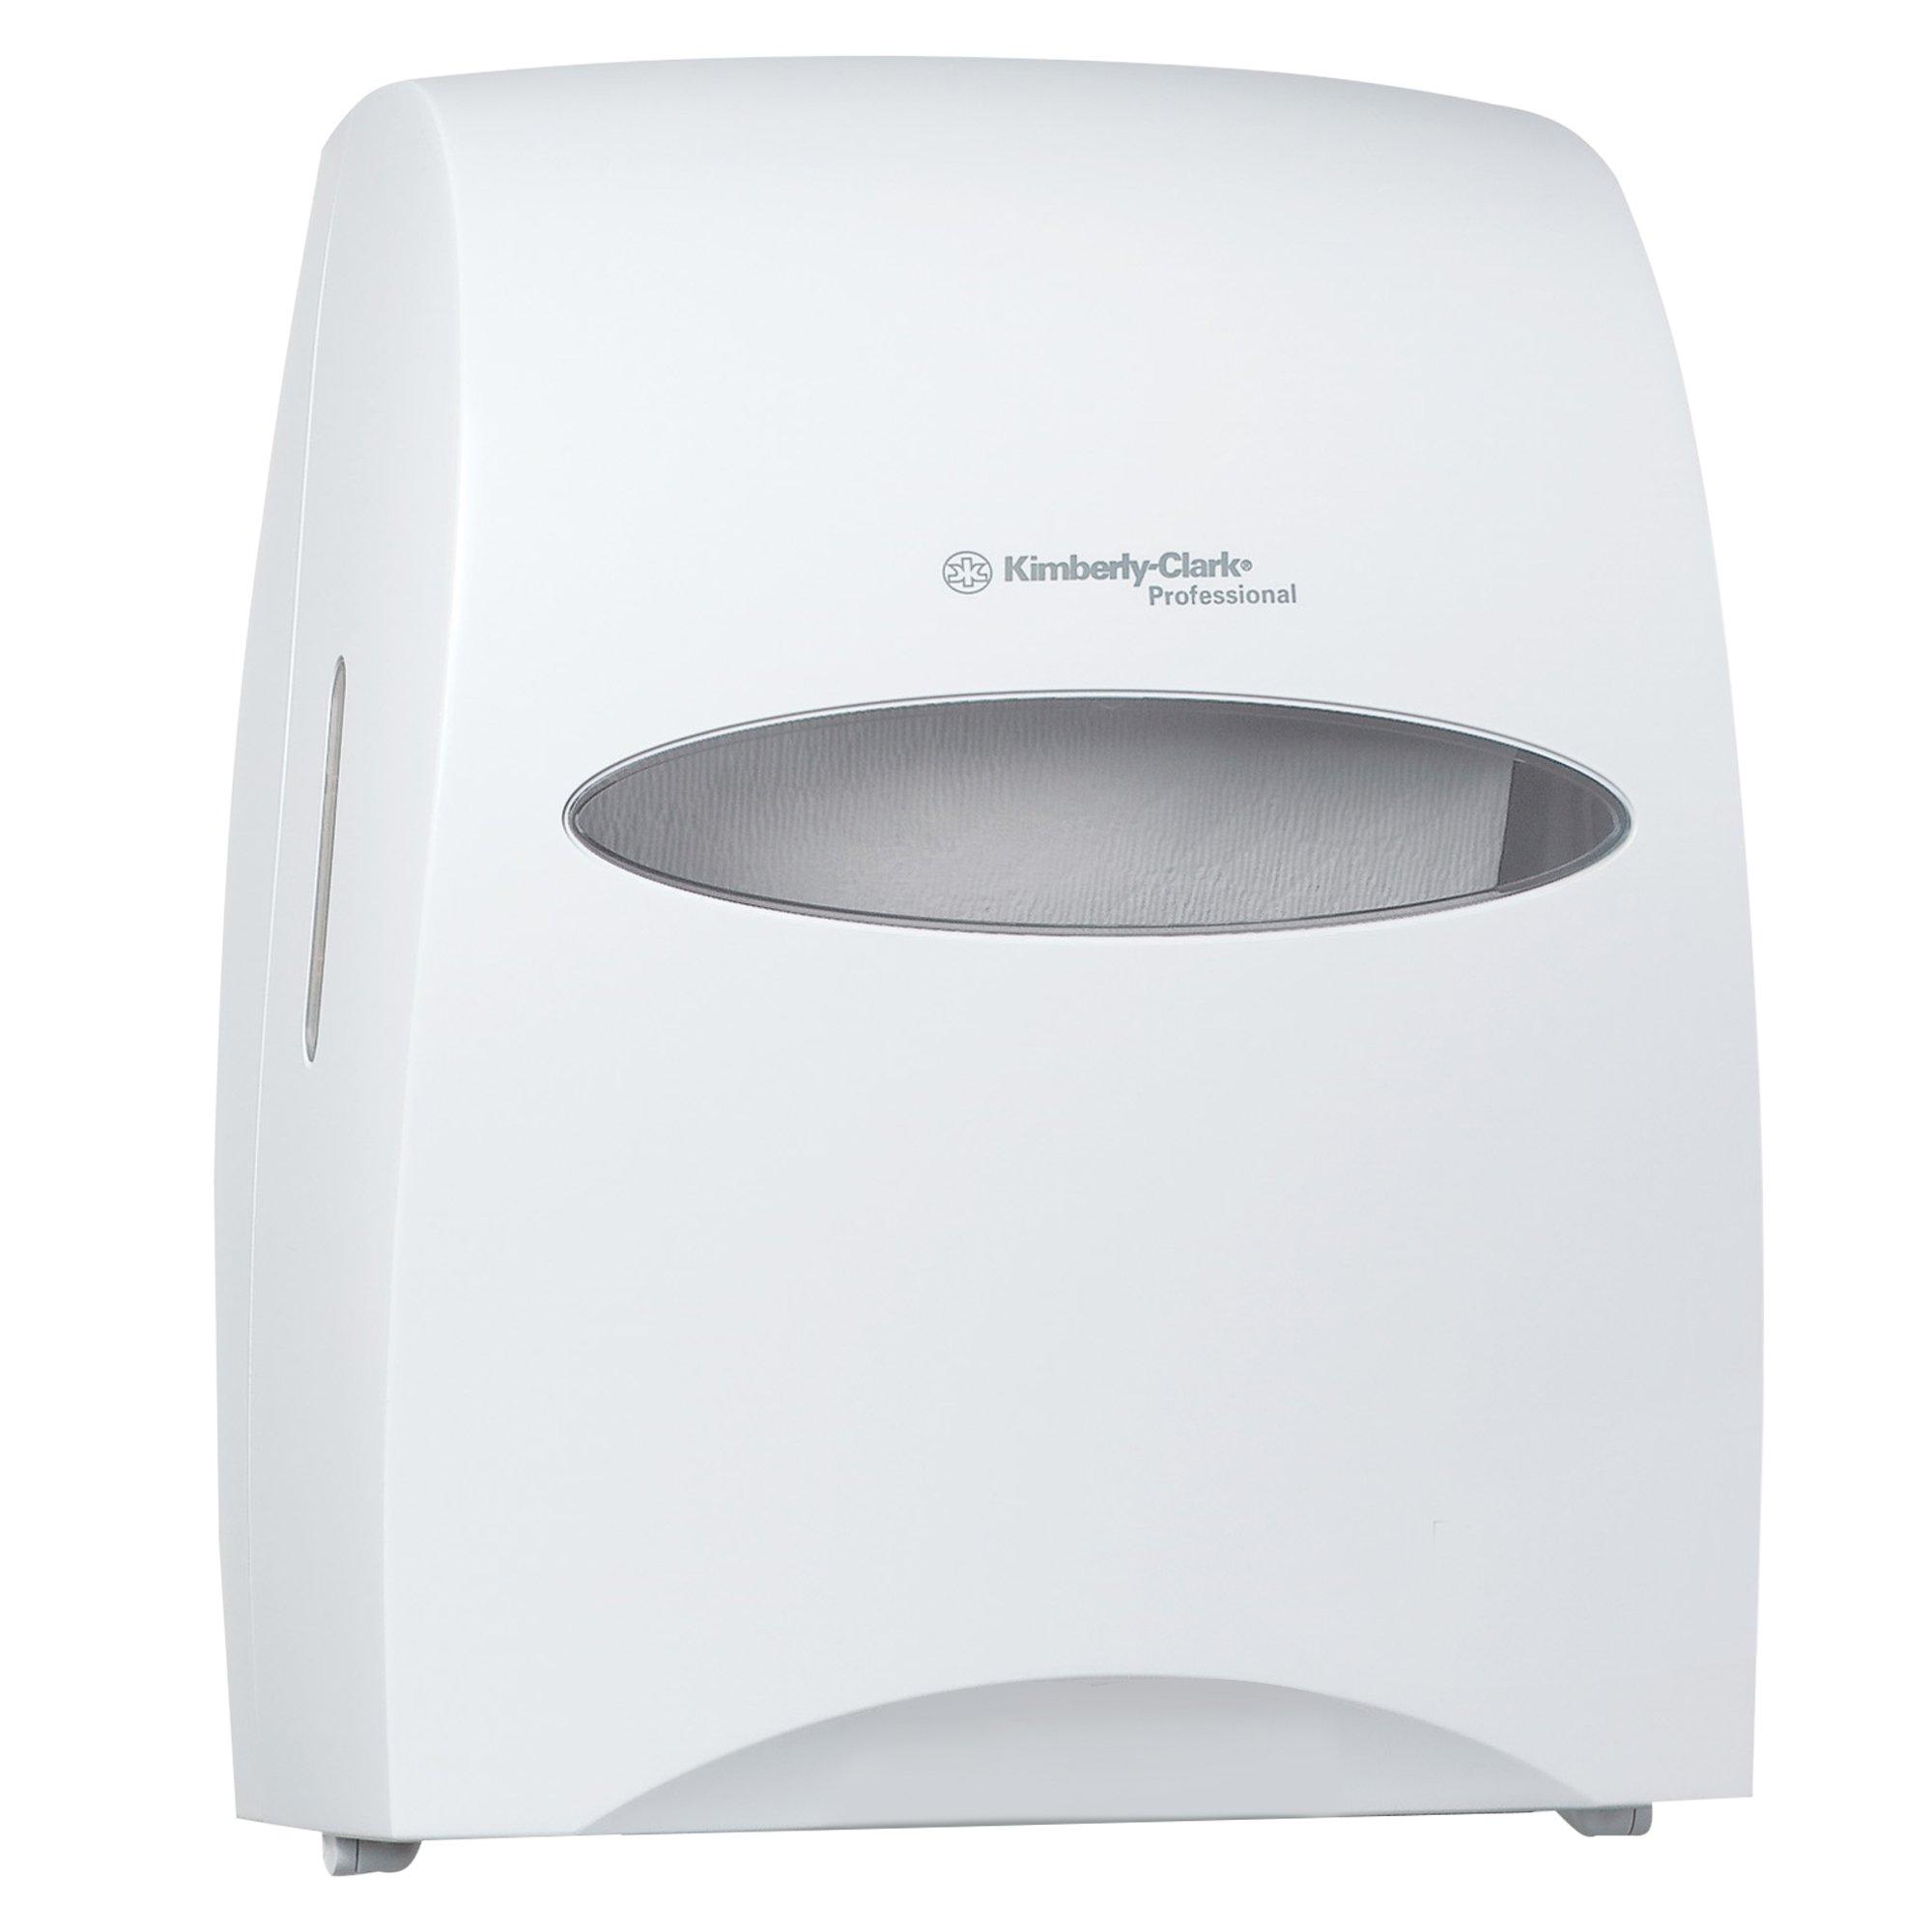 WINDOWS 09991 White SaniTouch Roll Towel Dispenser